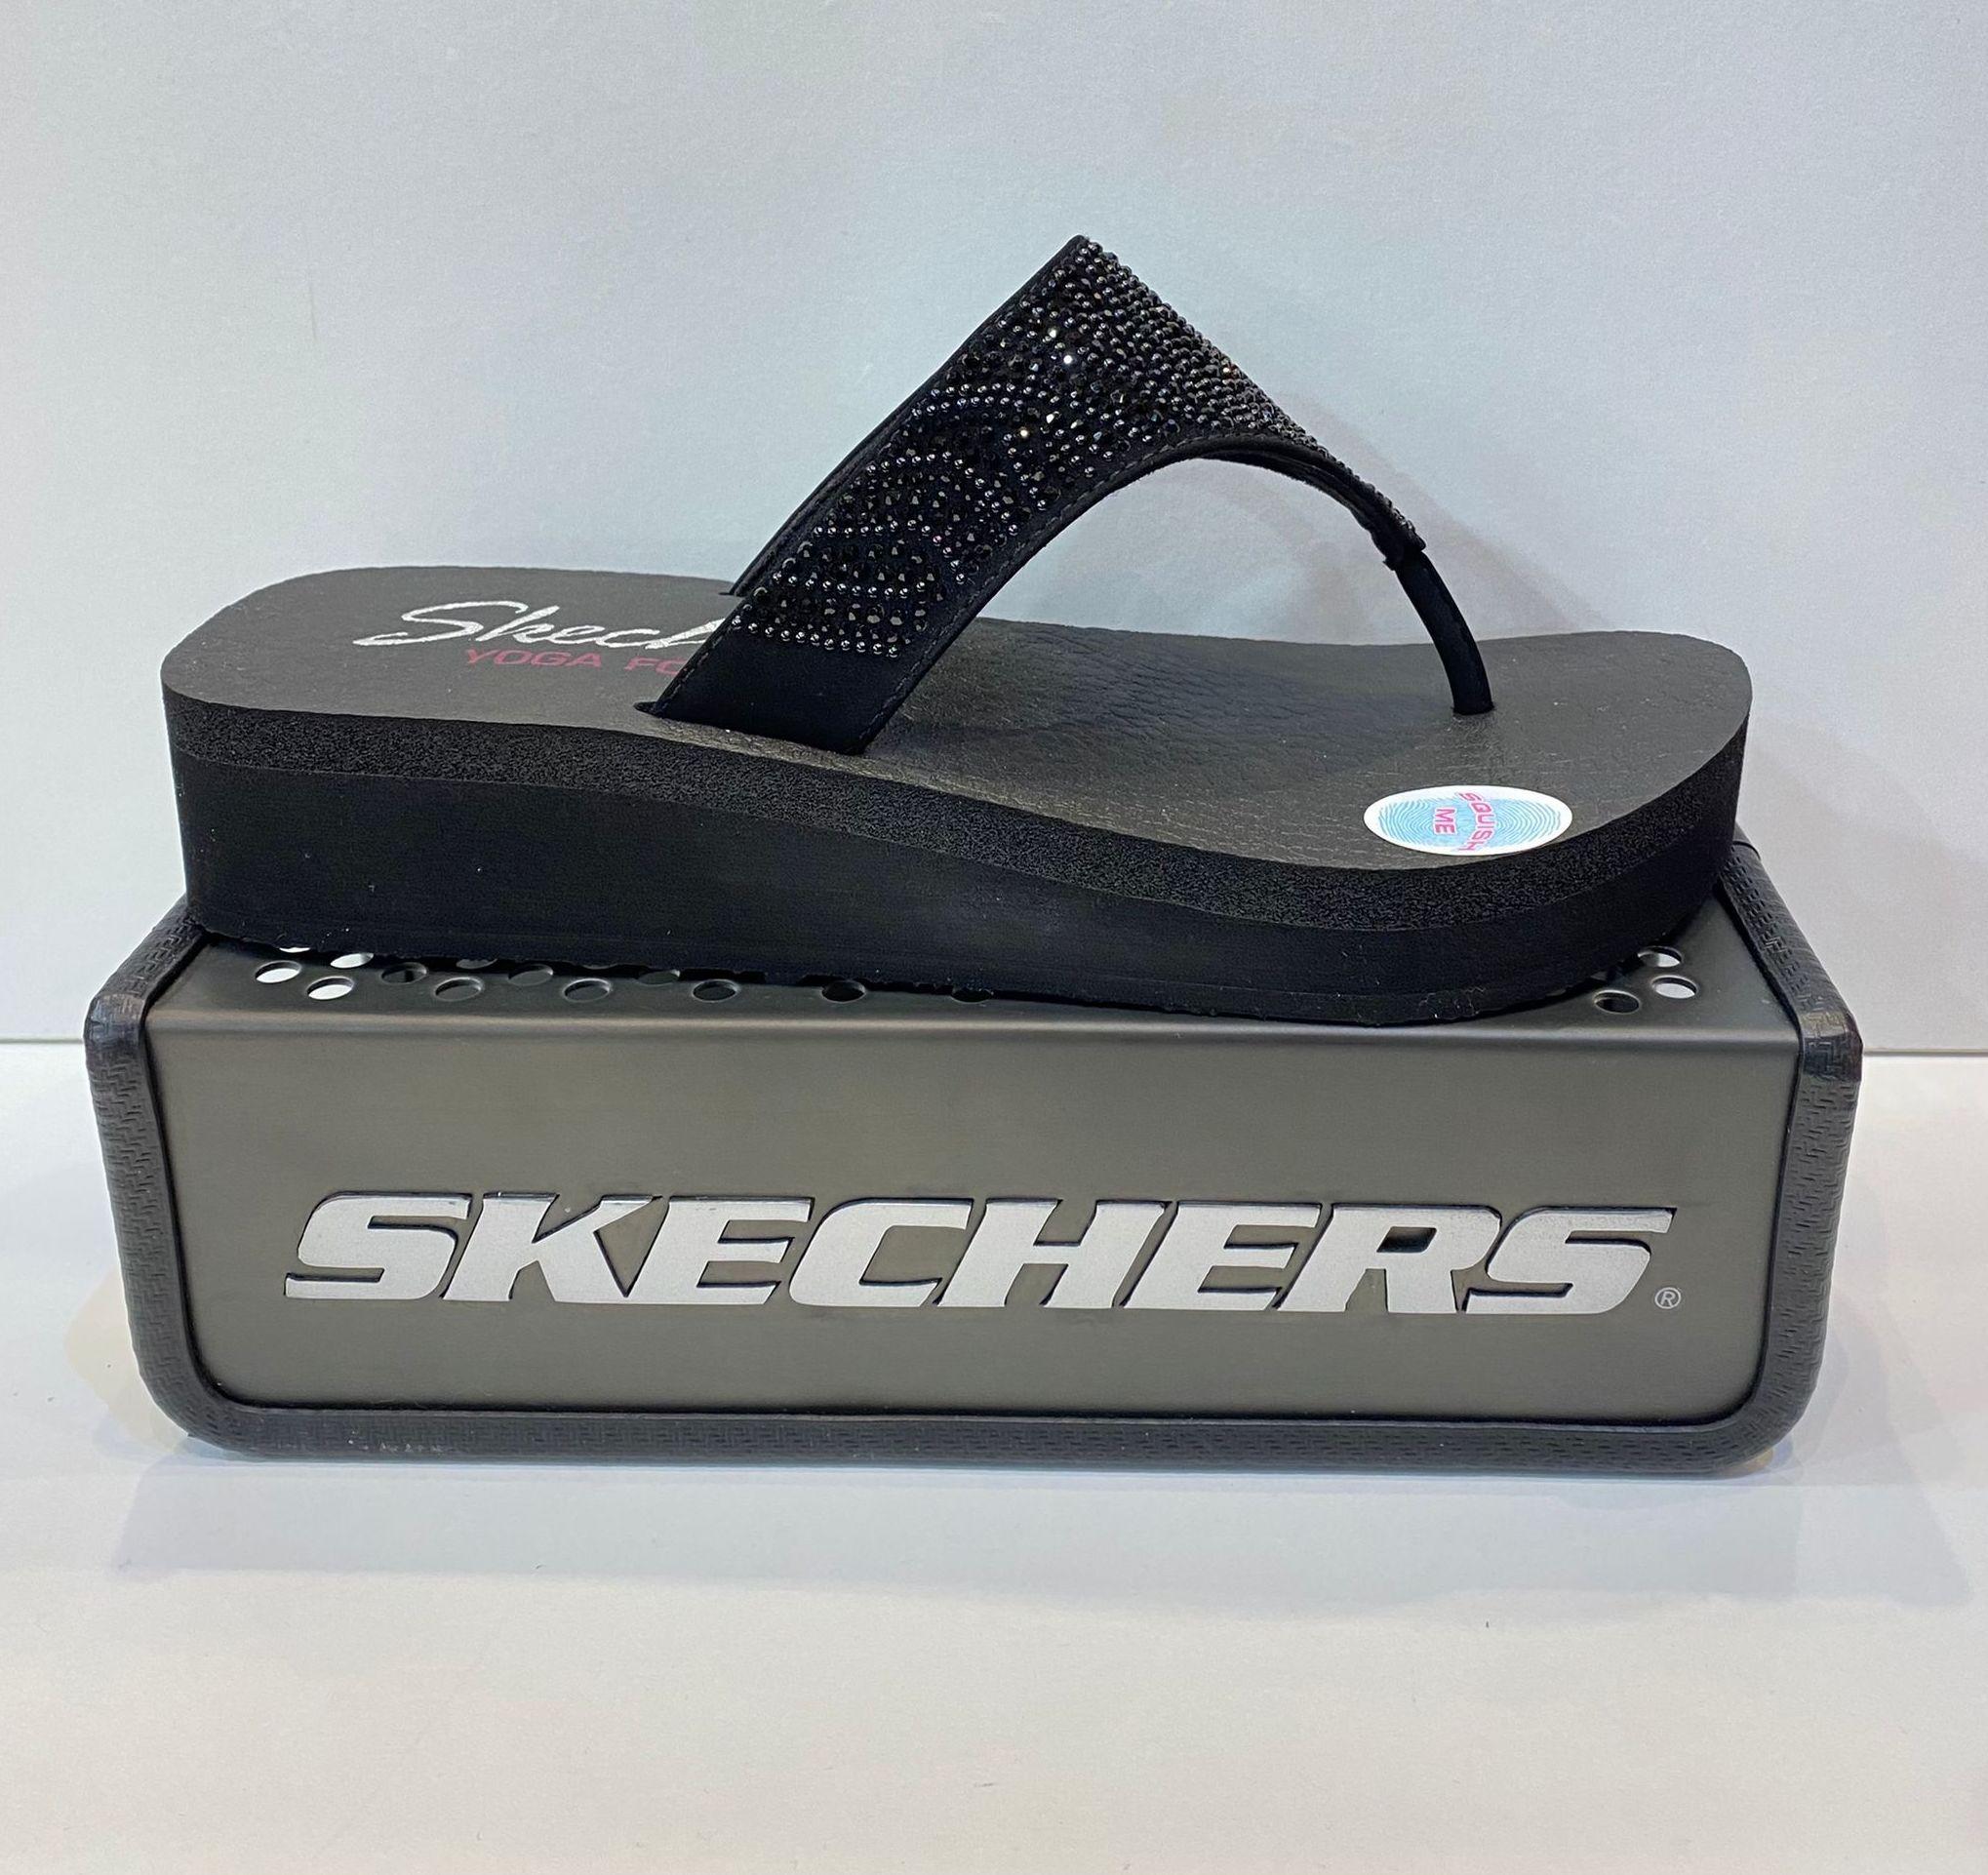 Esclava de dona, de la marca Skechers, plantilla Memory Foam, apte per a caminar i mullar 34.95€ www.calzadosllinas.es